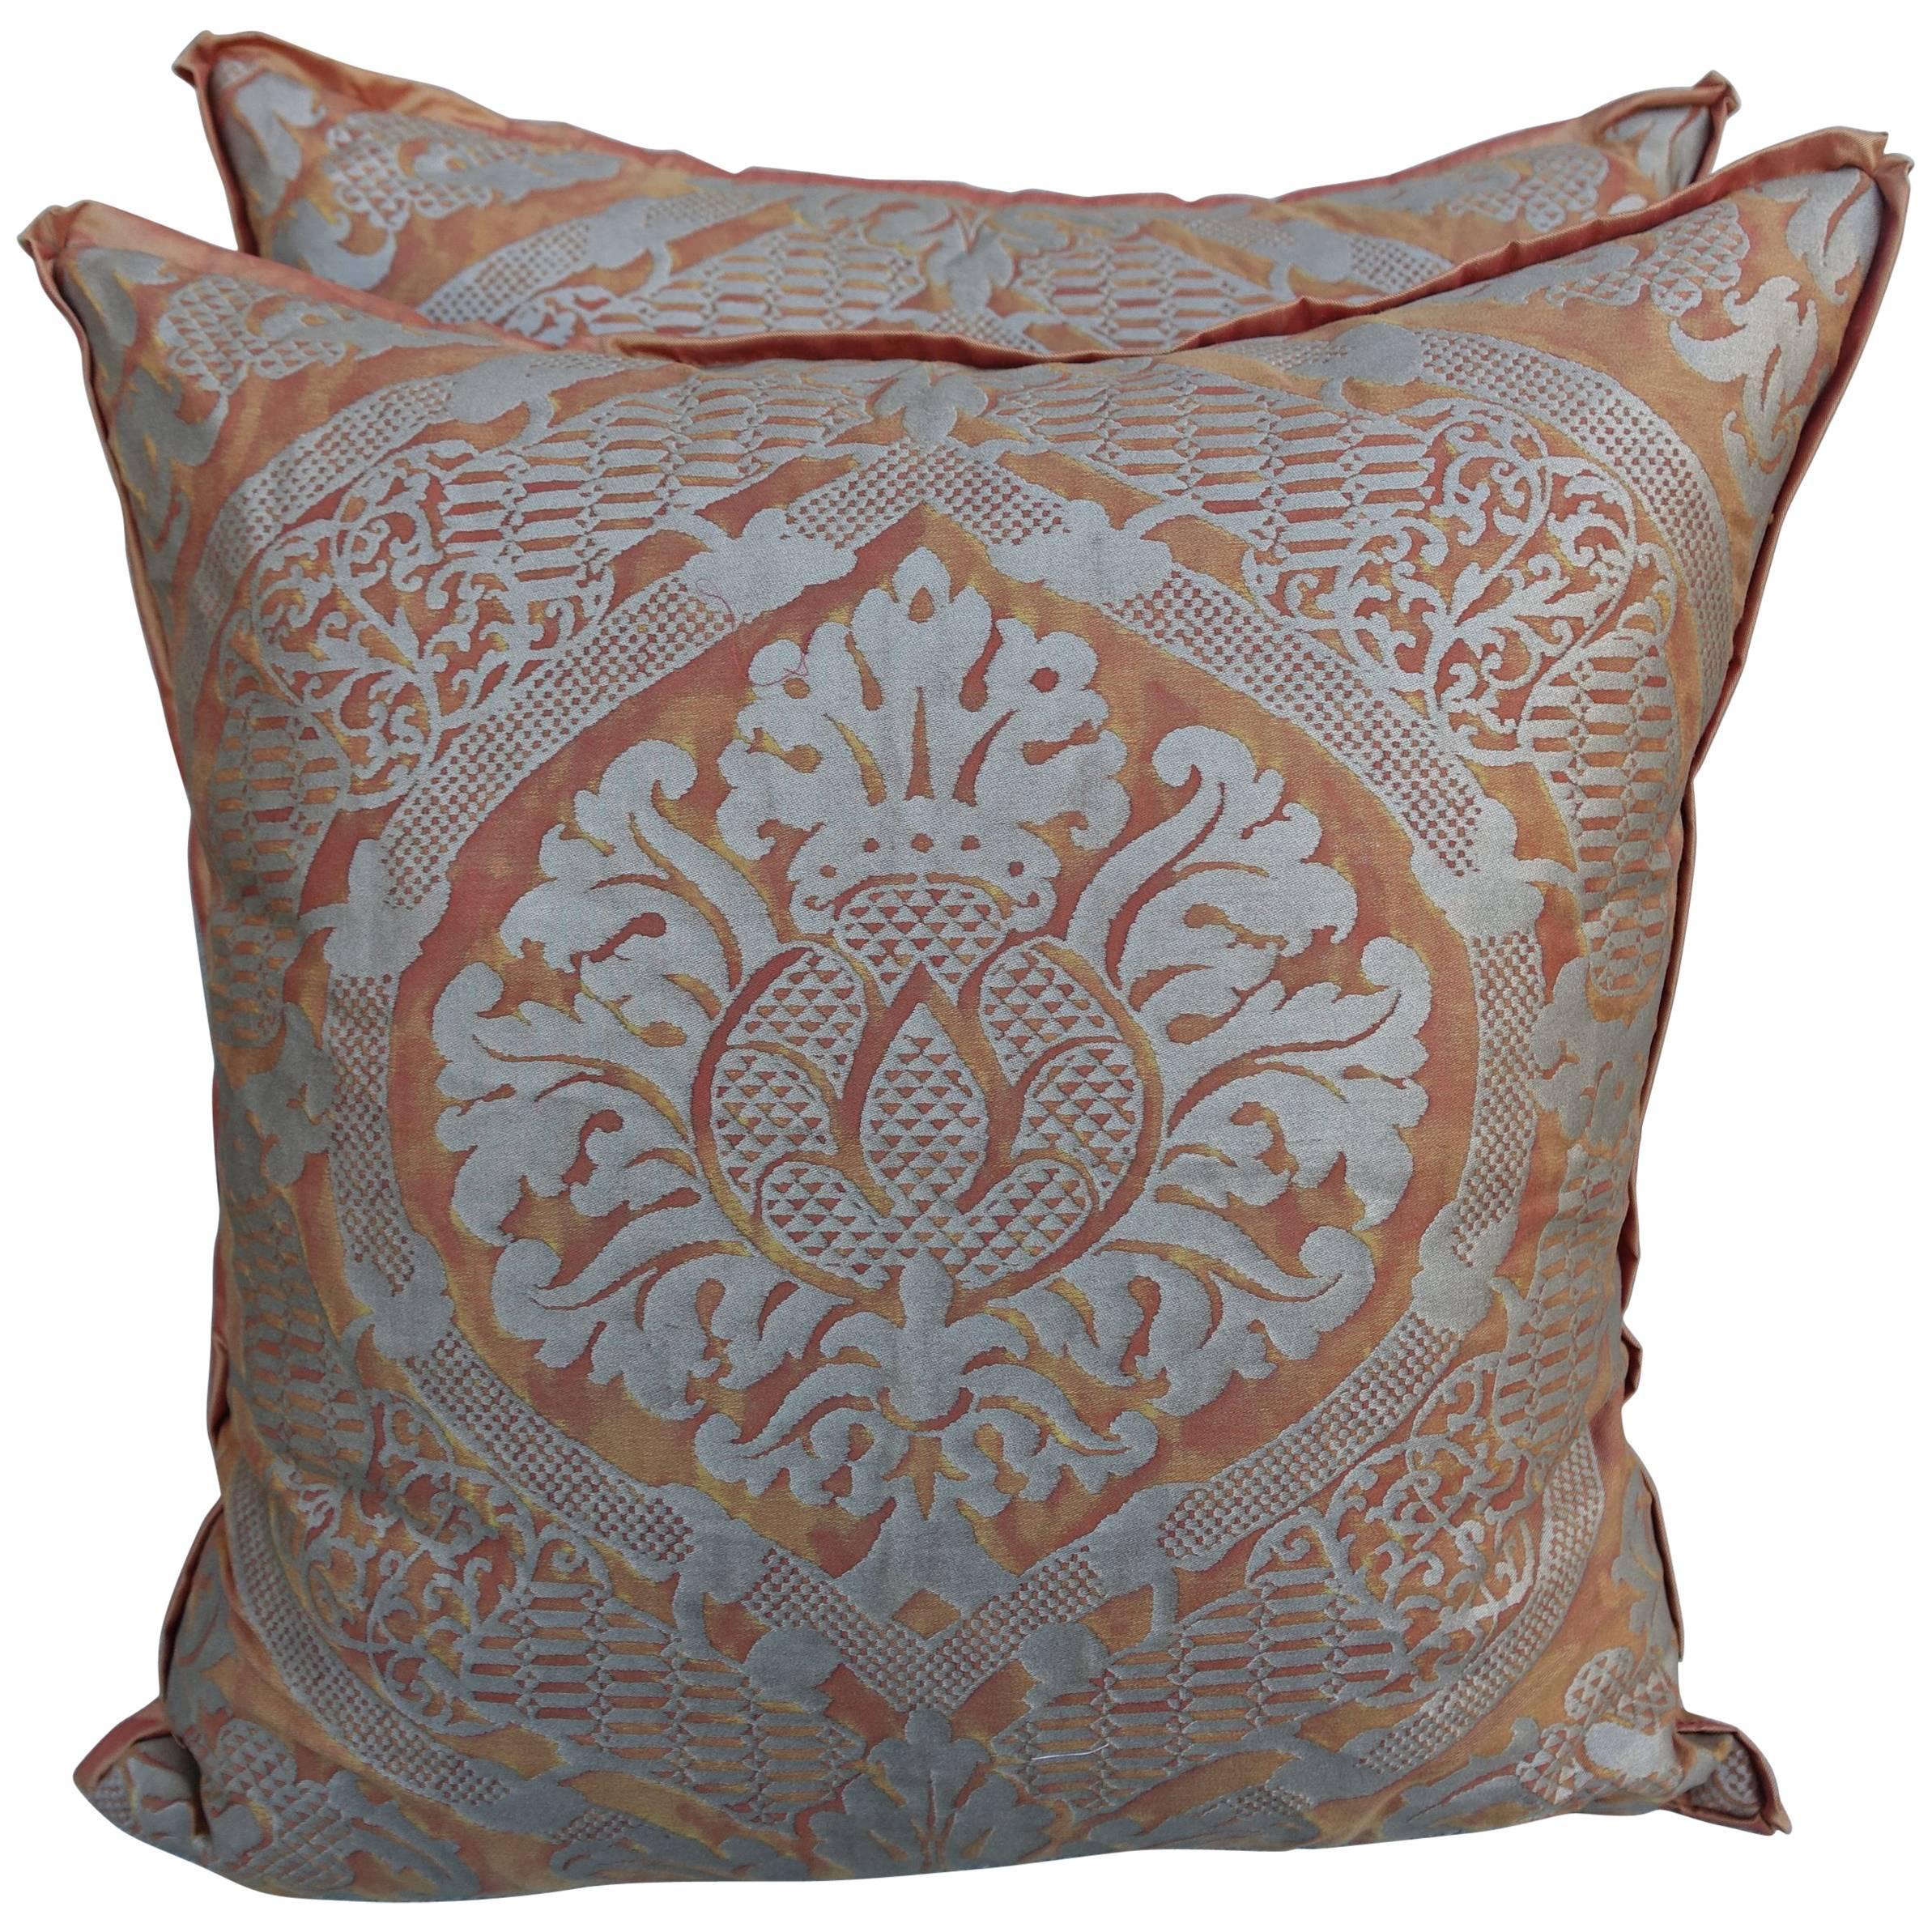 smith orange lumbar elaine throw pillow leisure living citrine products